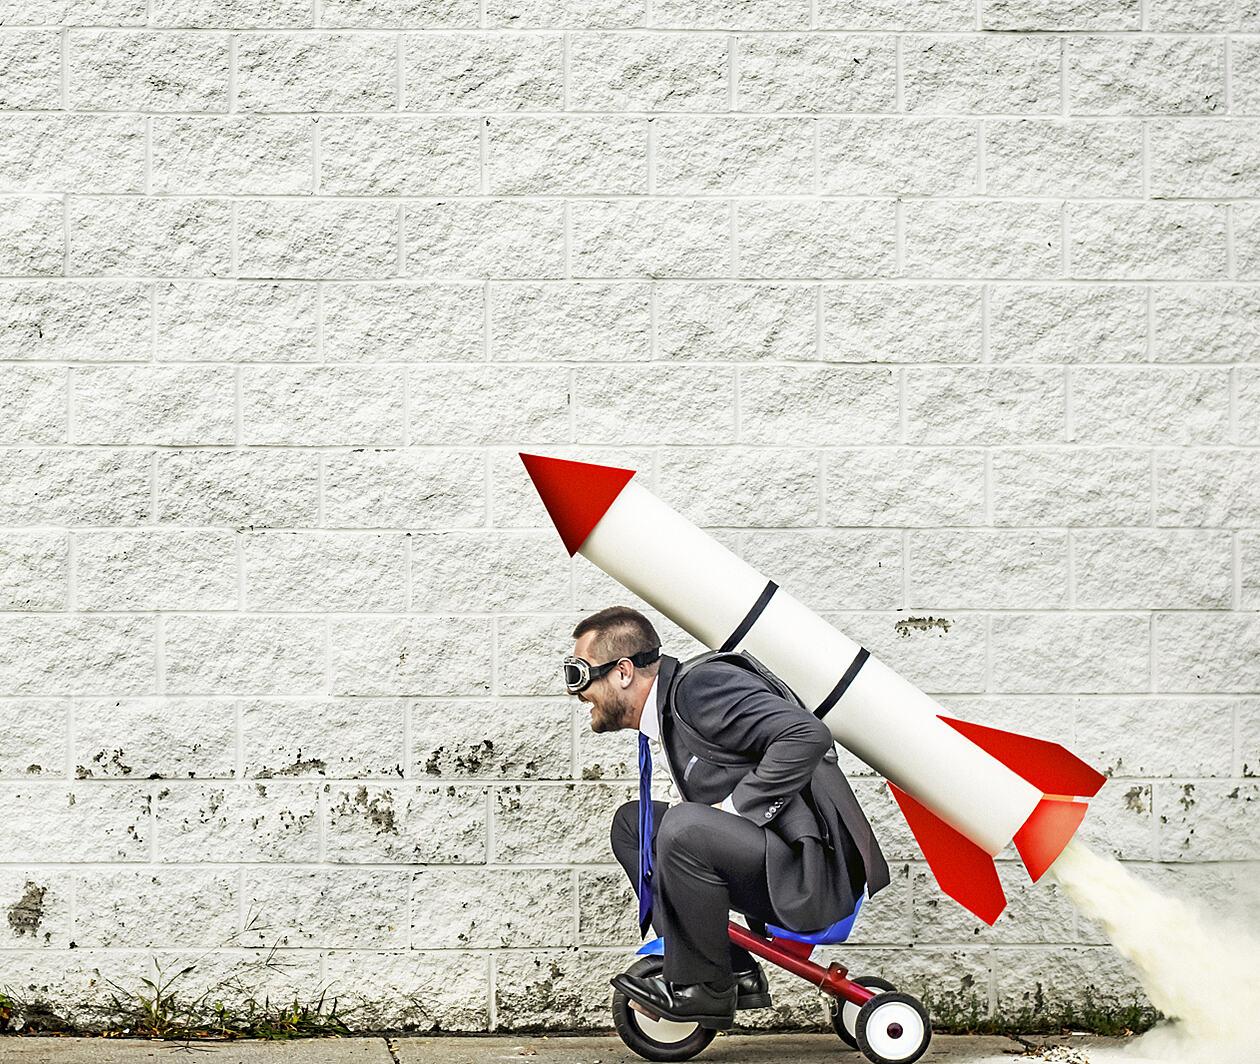 Teach like an Entrepreneur: Bringing Entrepreneurship into the Classroom